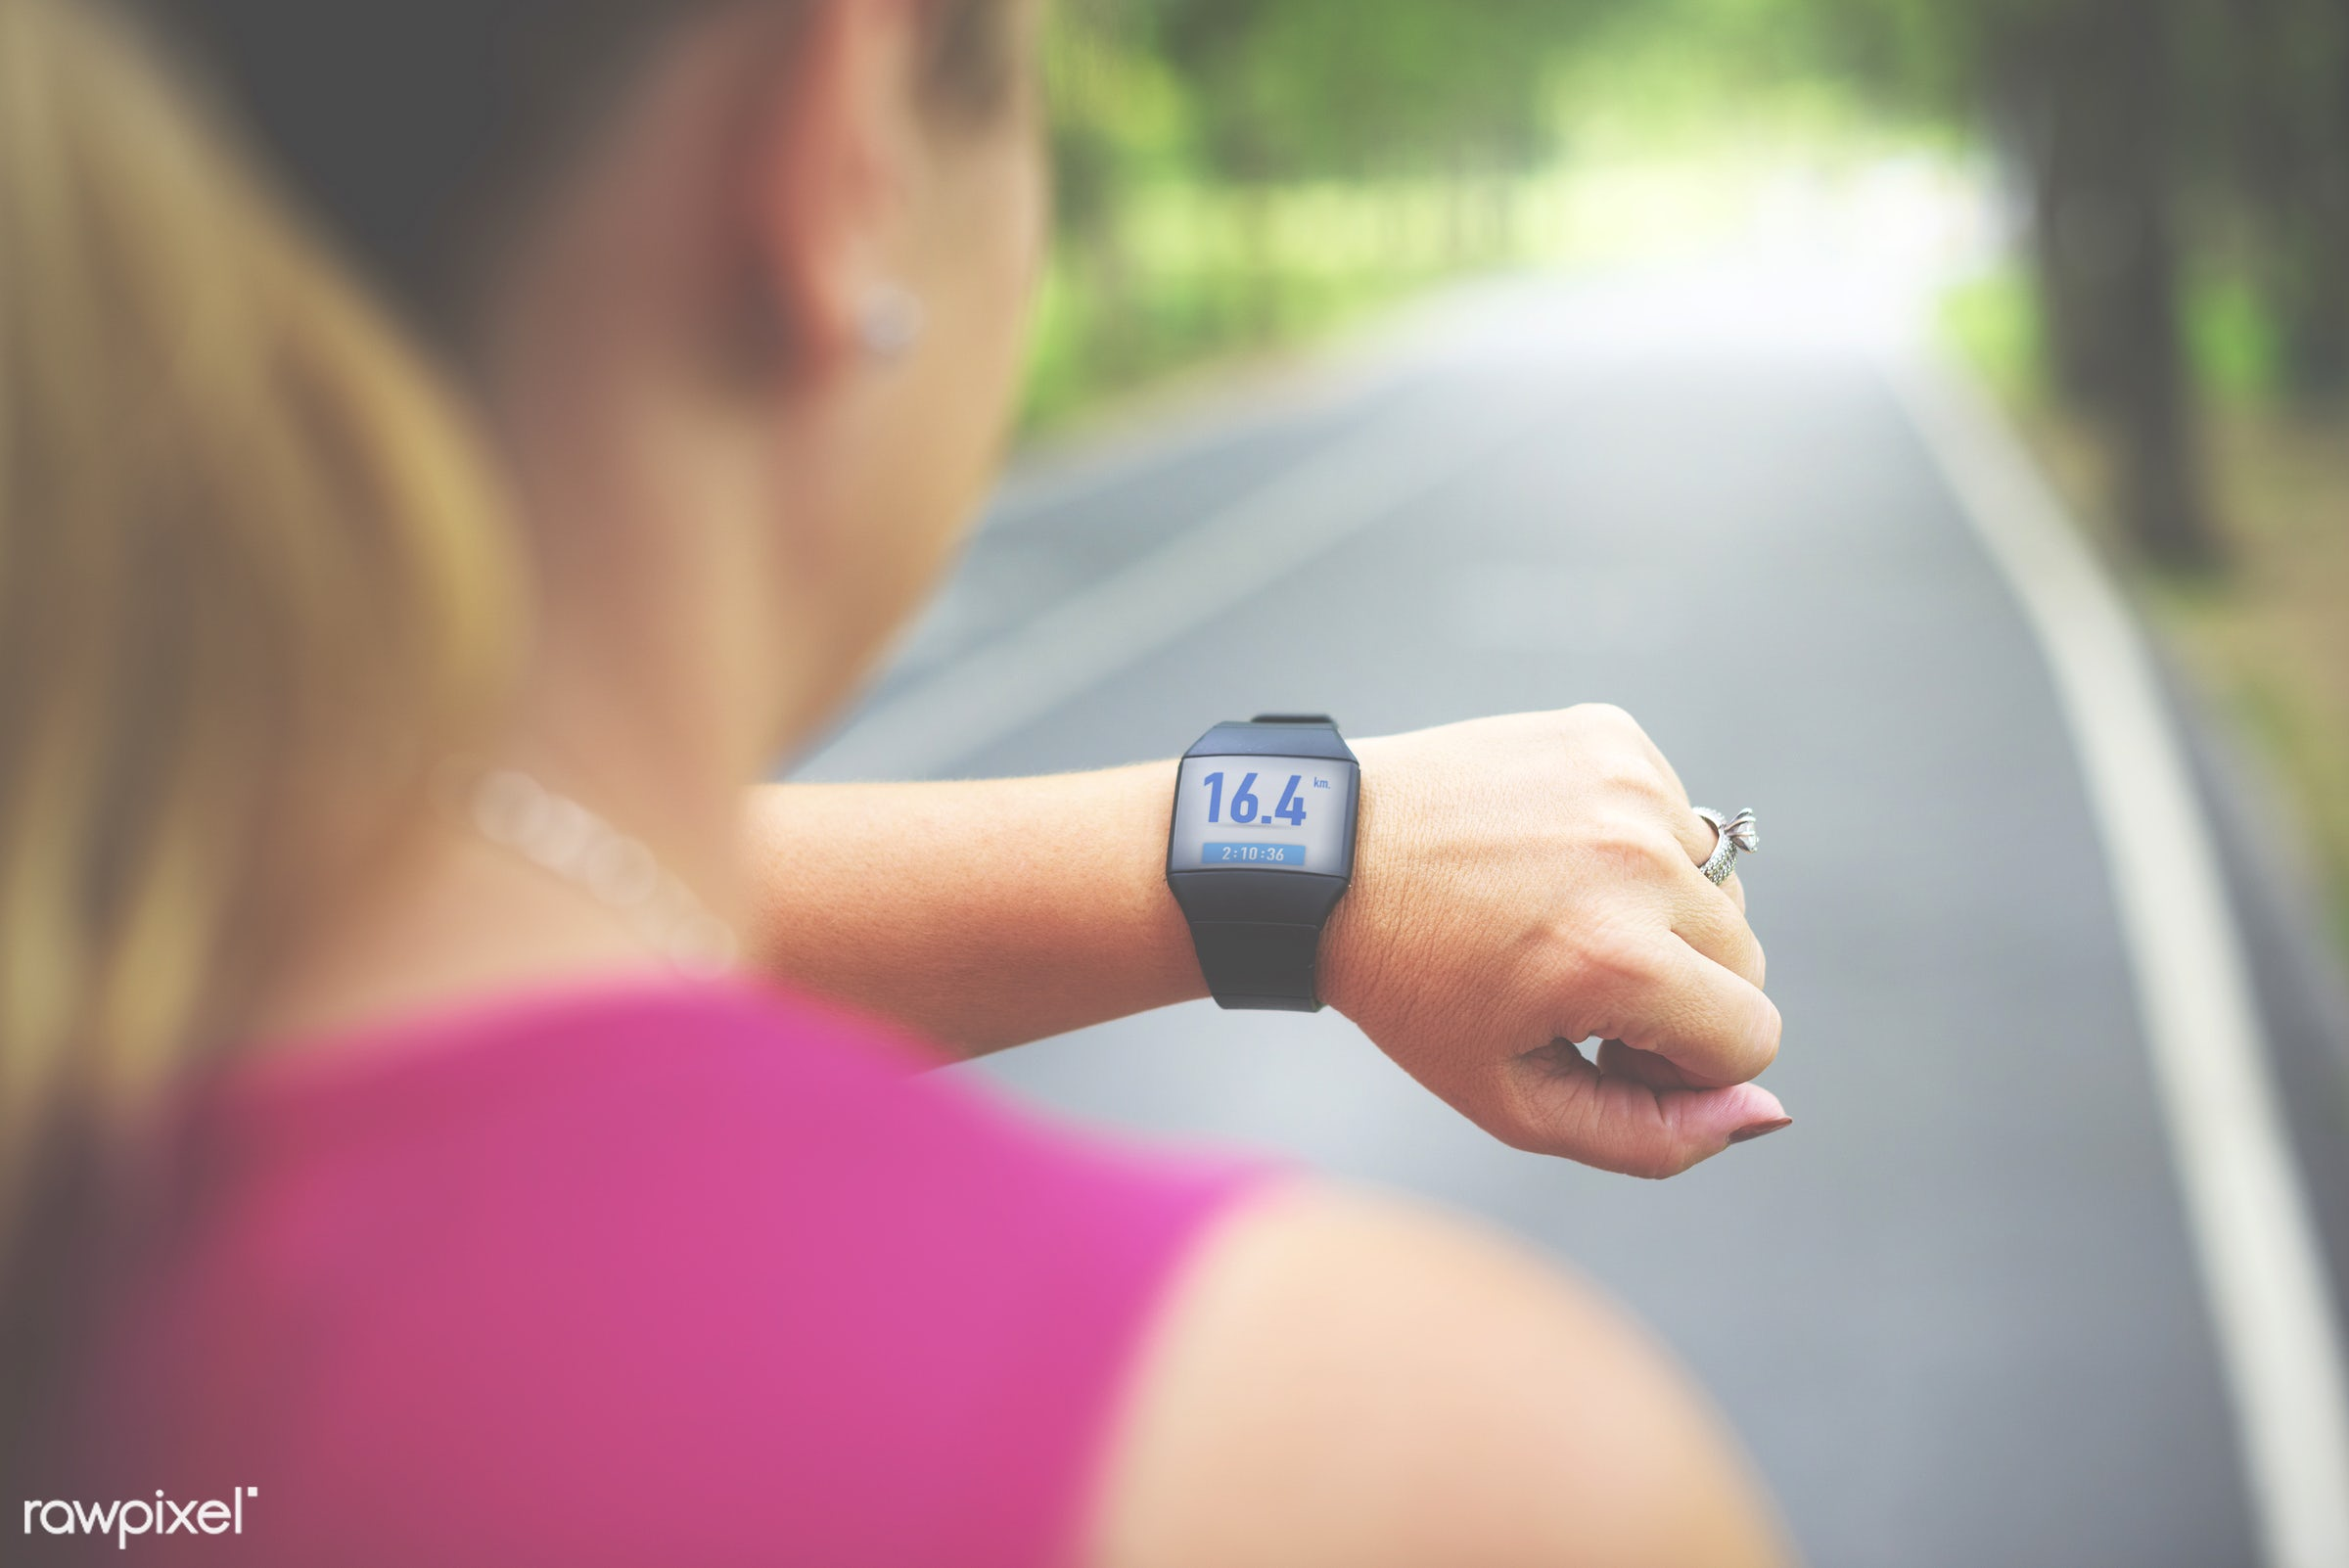 Woman checking distance on smartwatch - wellness, fitness, app, smartwatch, runner, practice, media, healthy, active,...